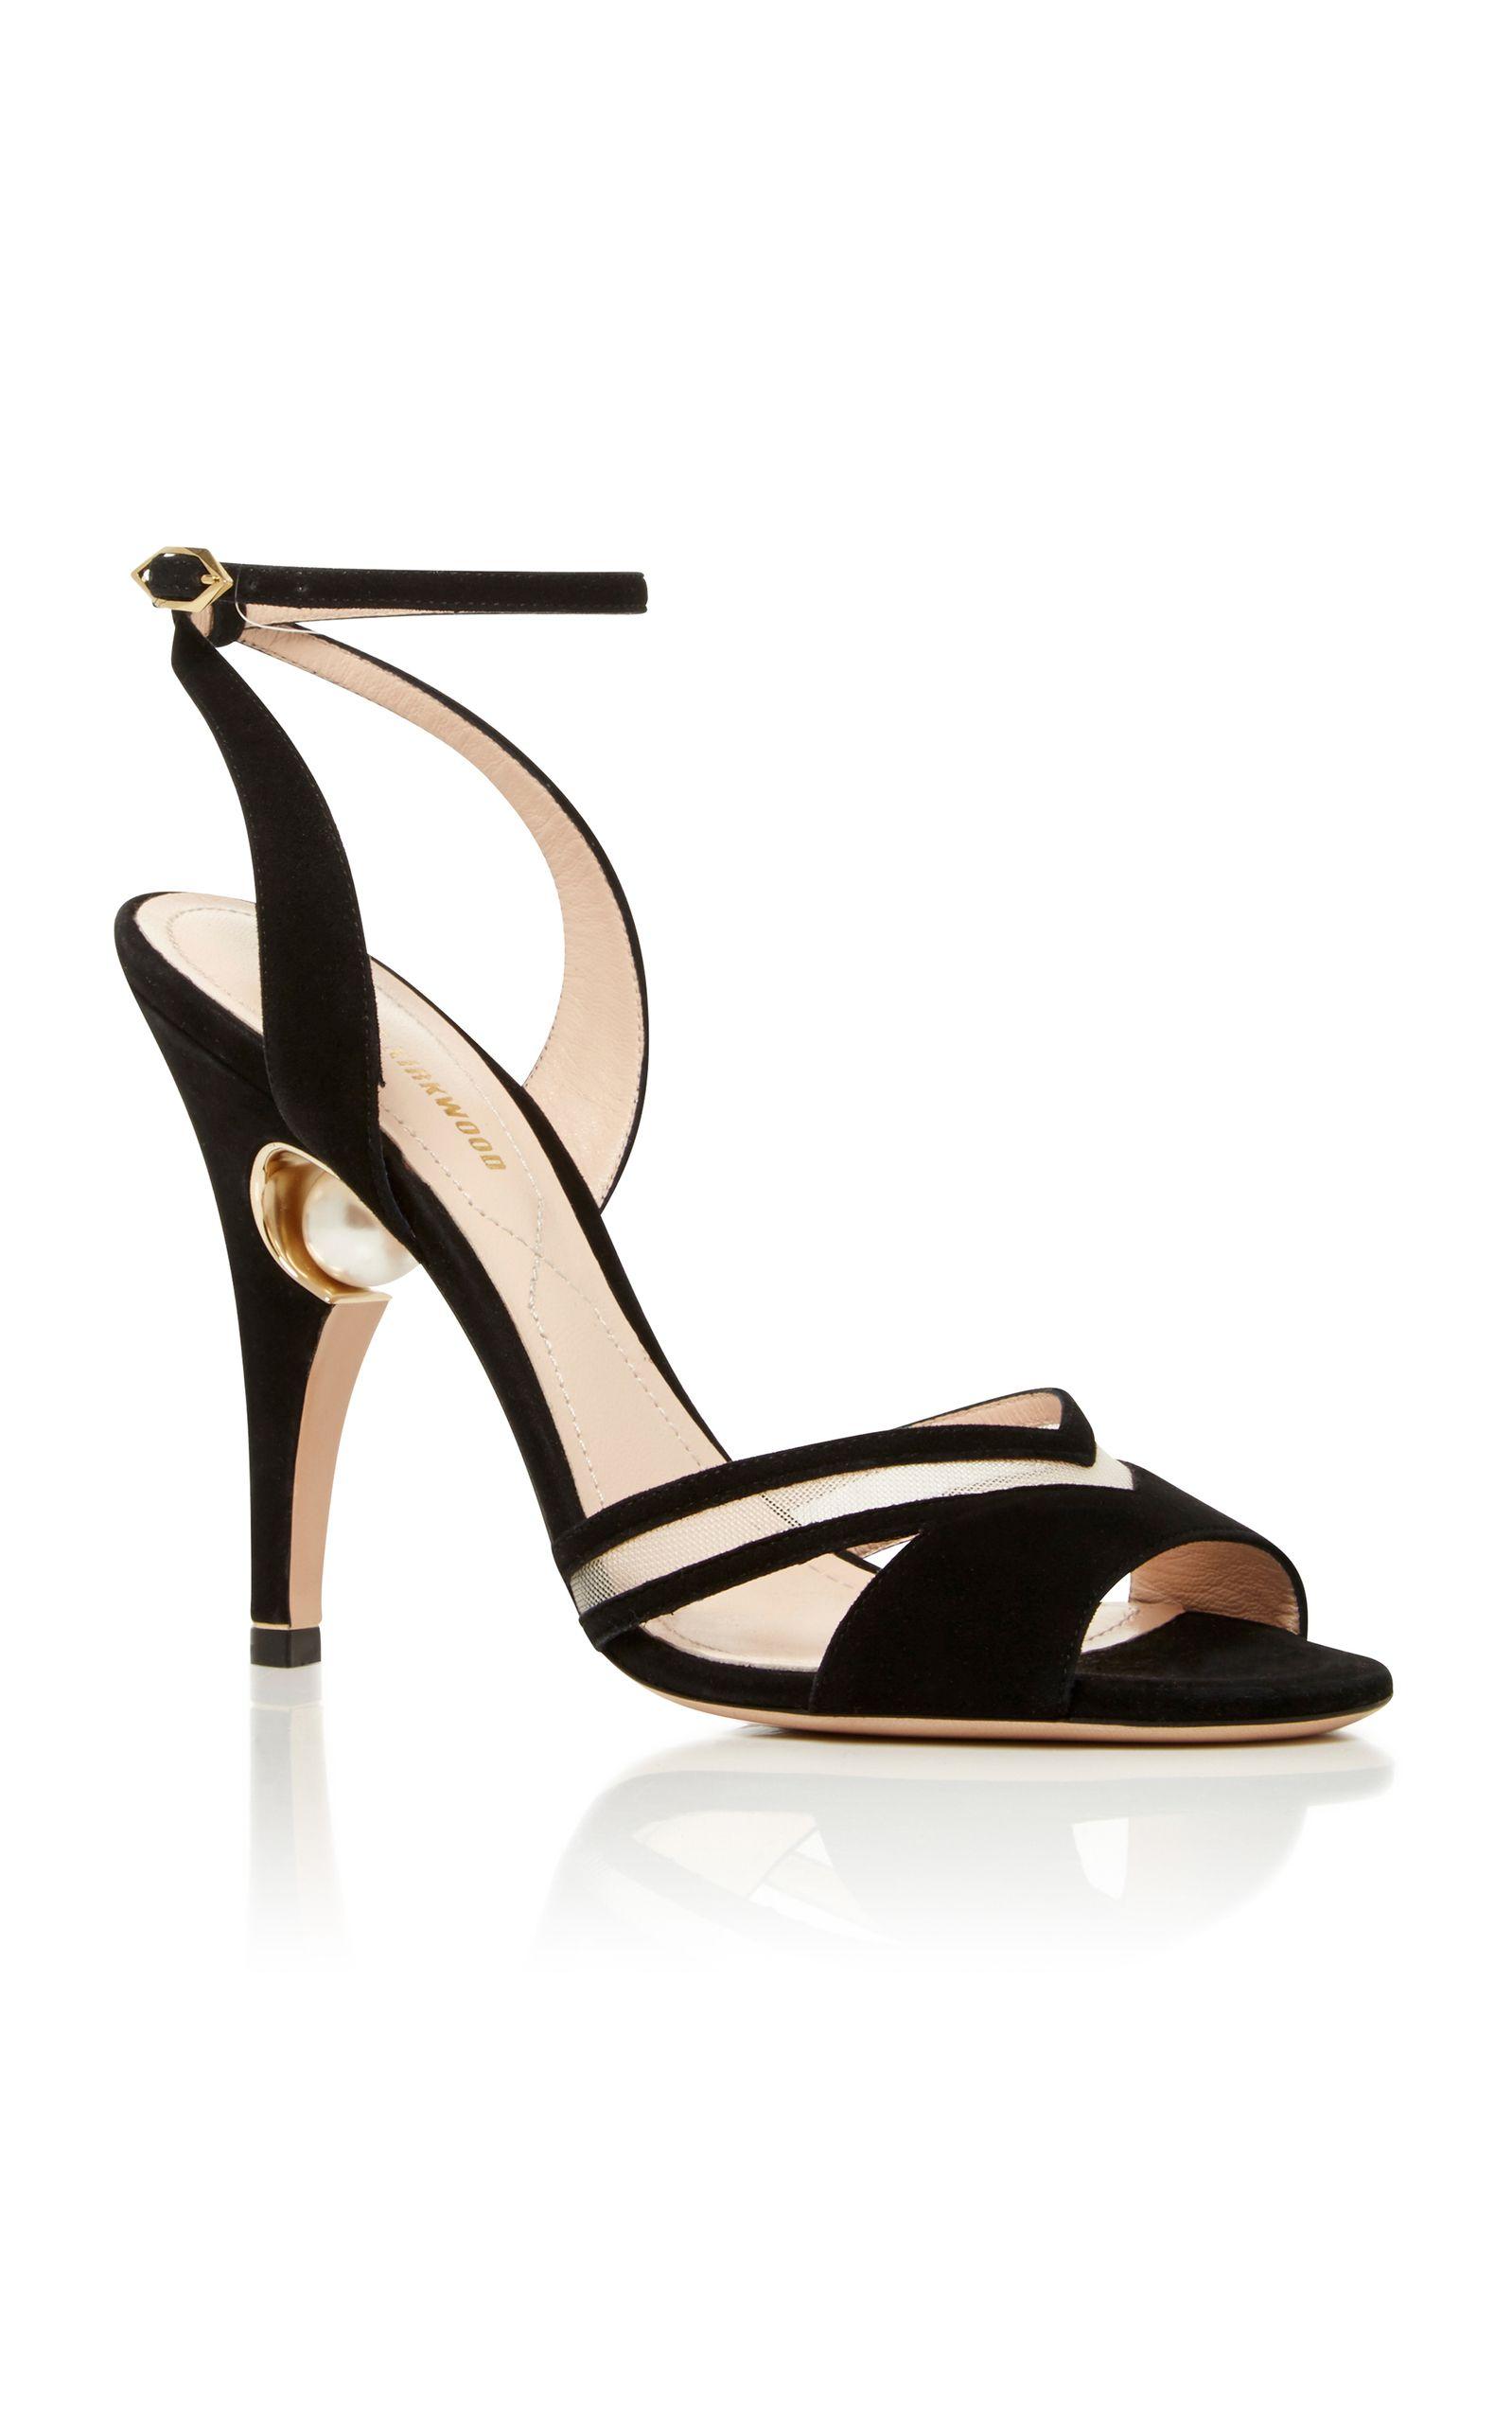 Nicholas Kirkwood Penelope Pearl Sandals | Pearl sandals